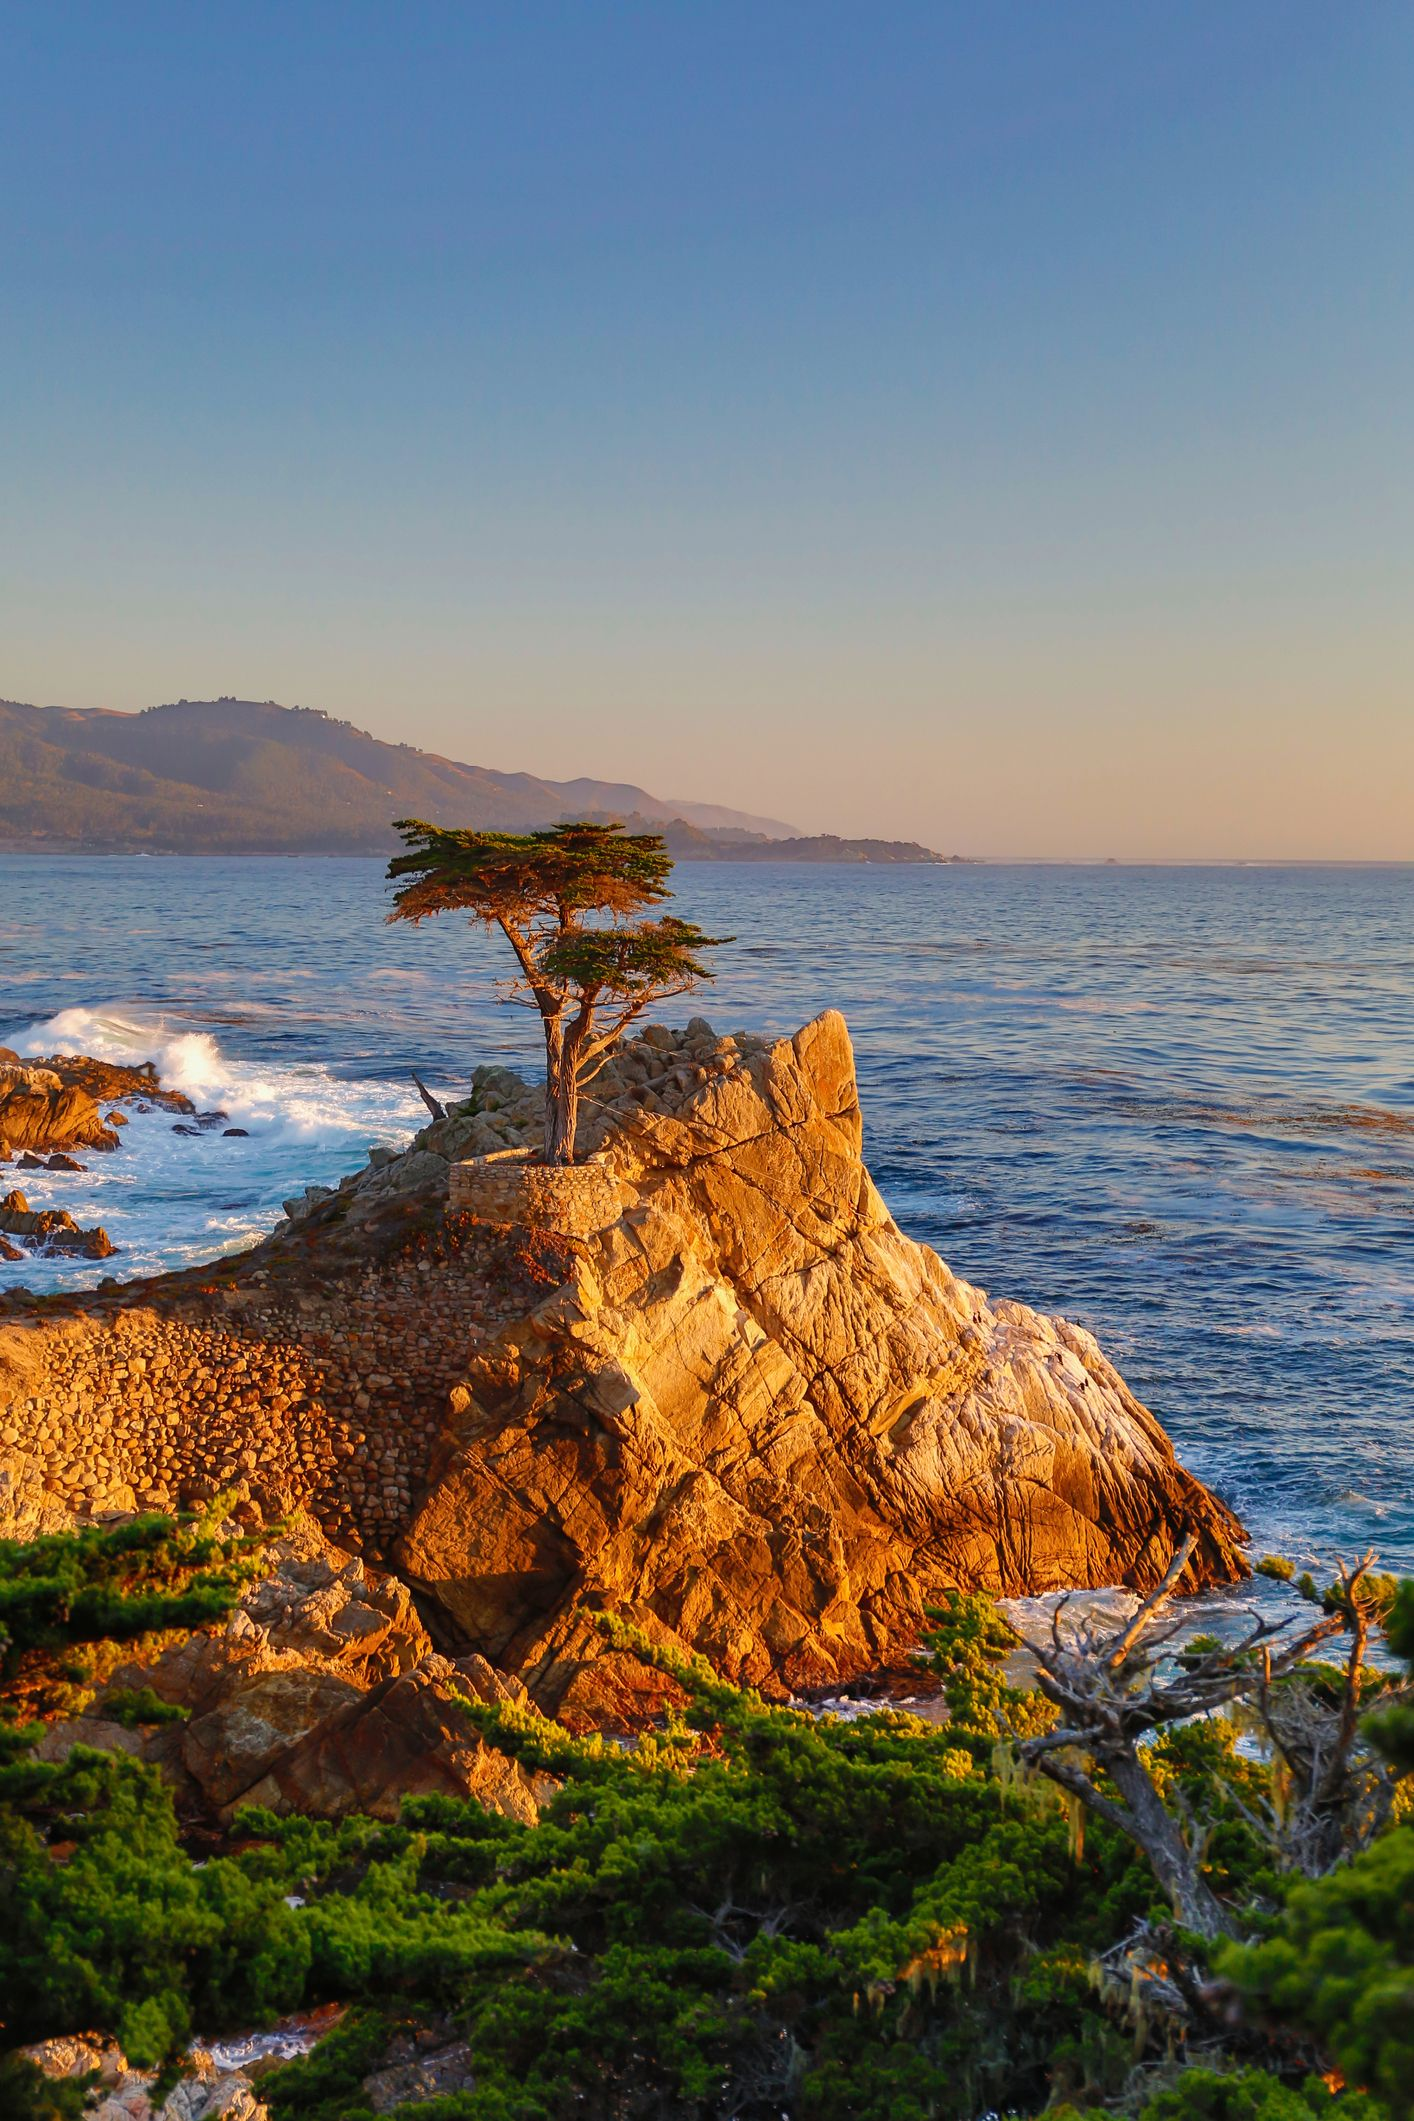 fall beach vacation ideas: carmel, california